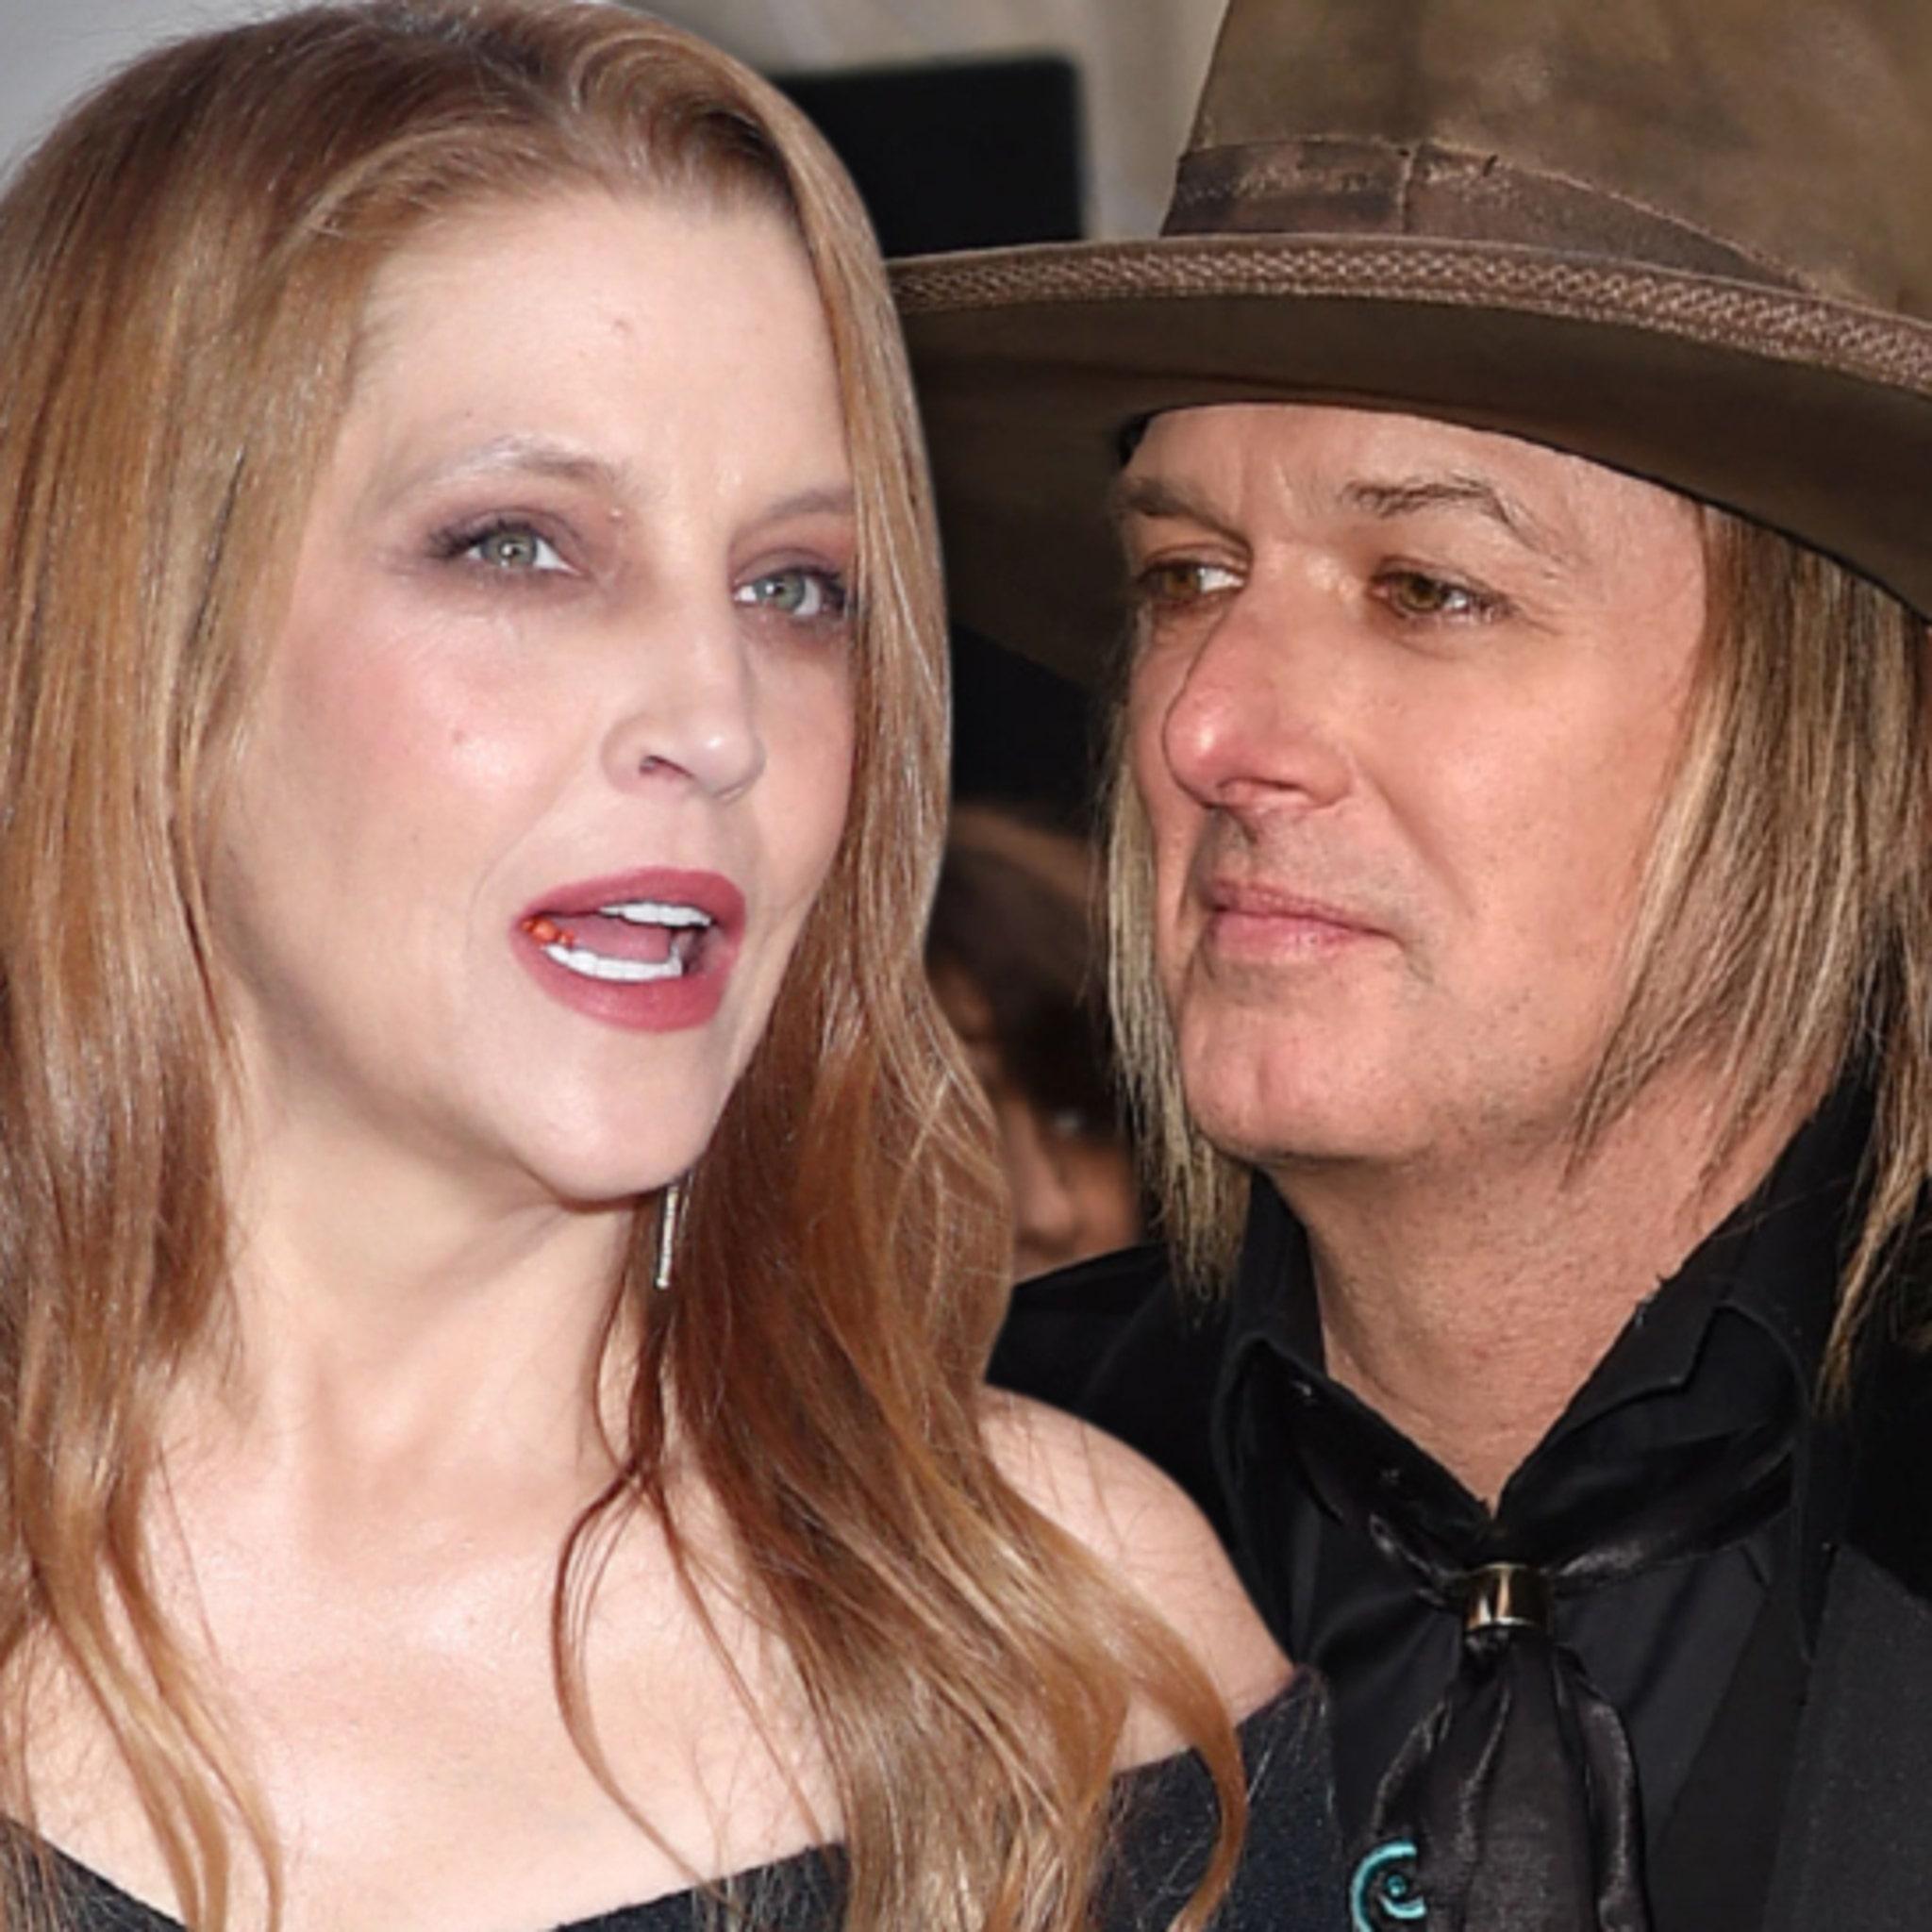 Lisa Marie Presley Ordered to Pay Estranged Husband Michael Lockwood